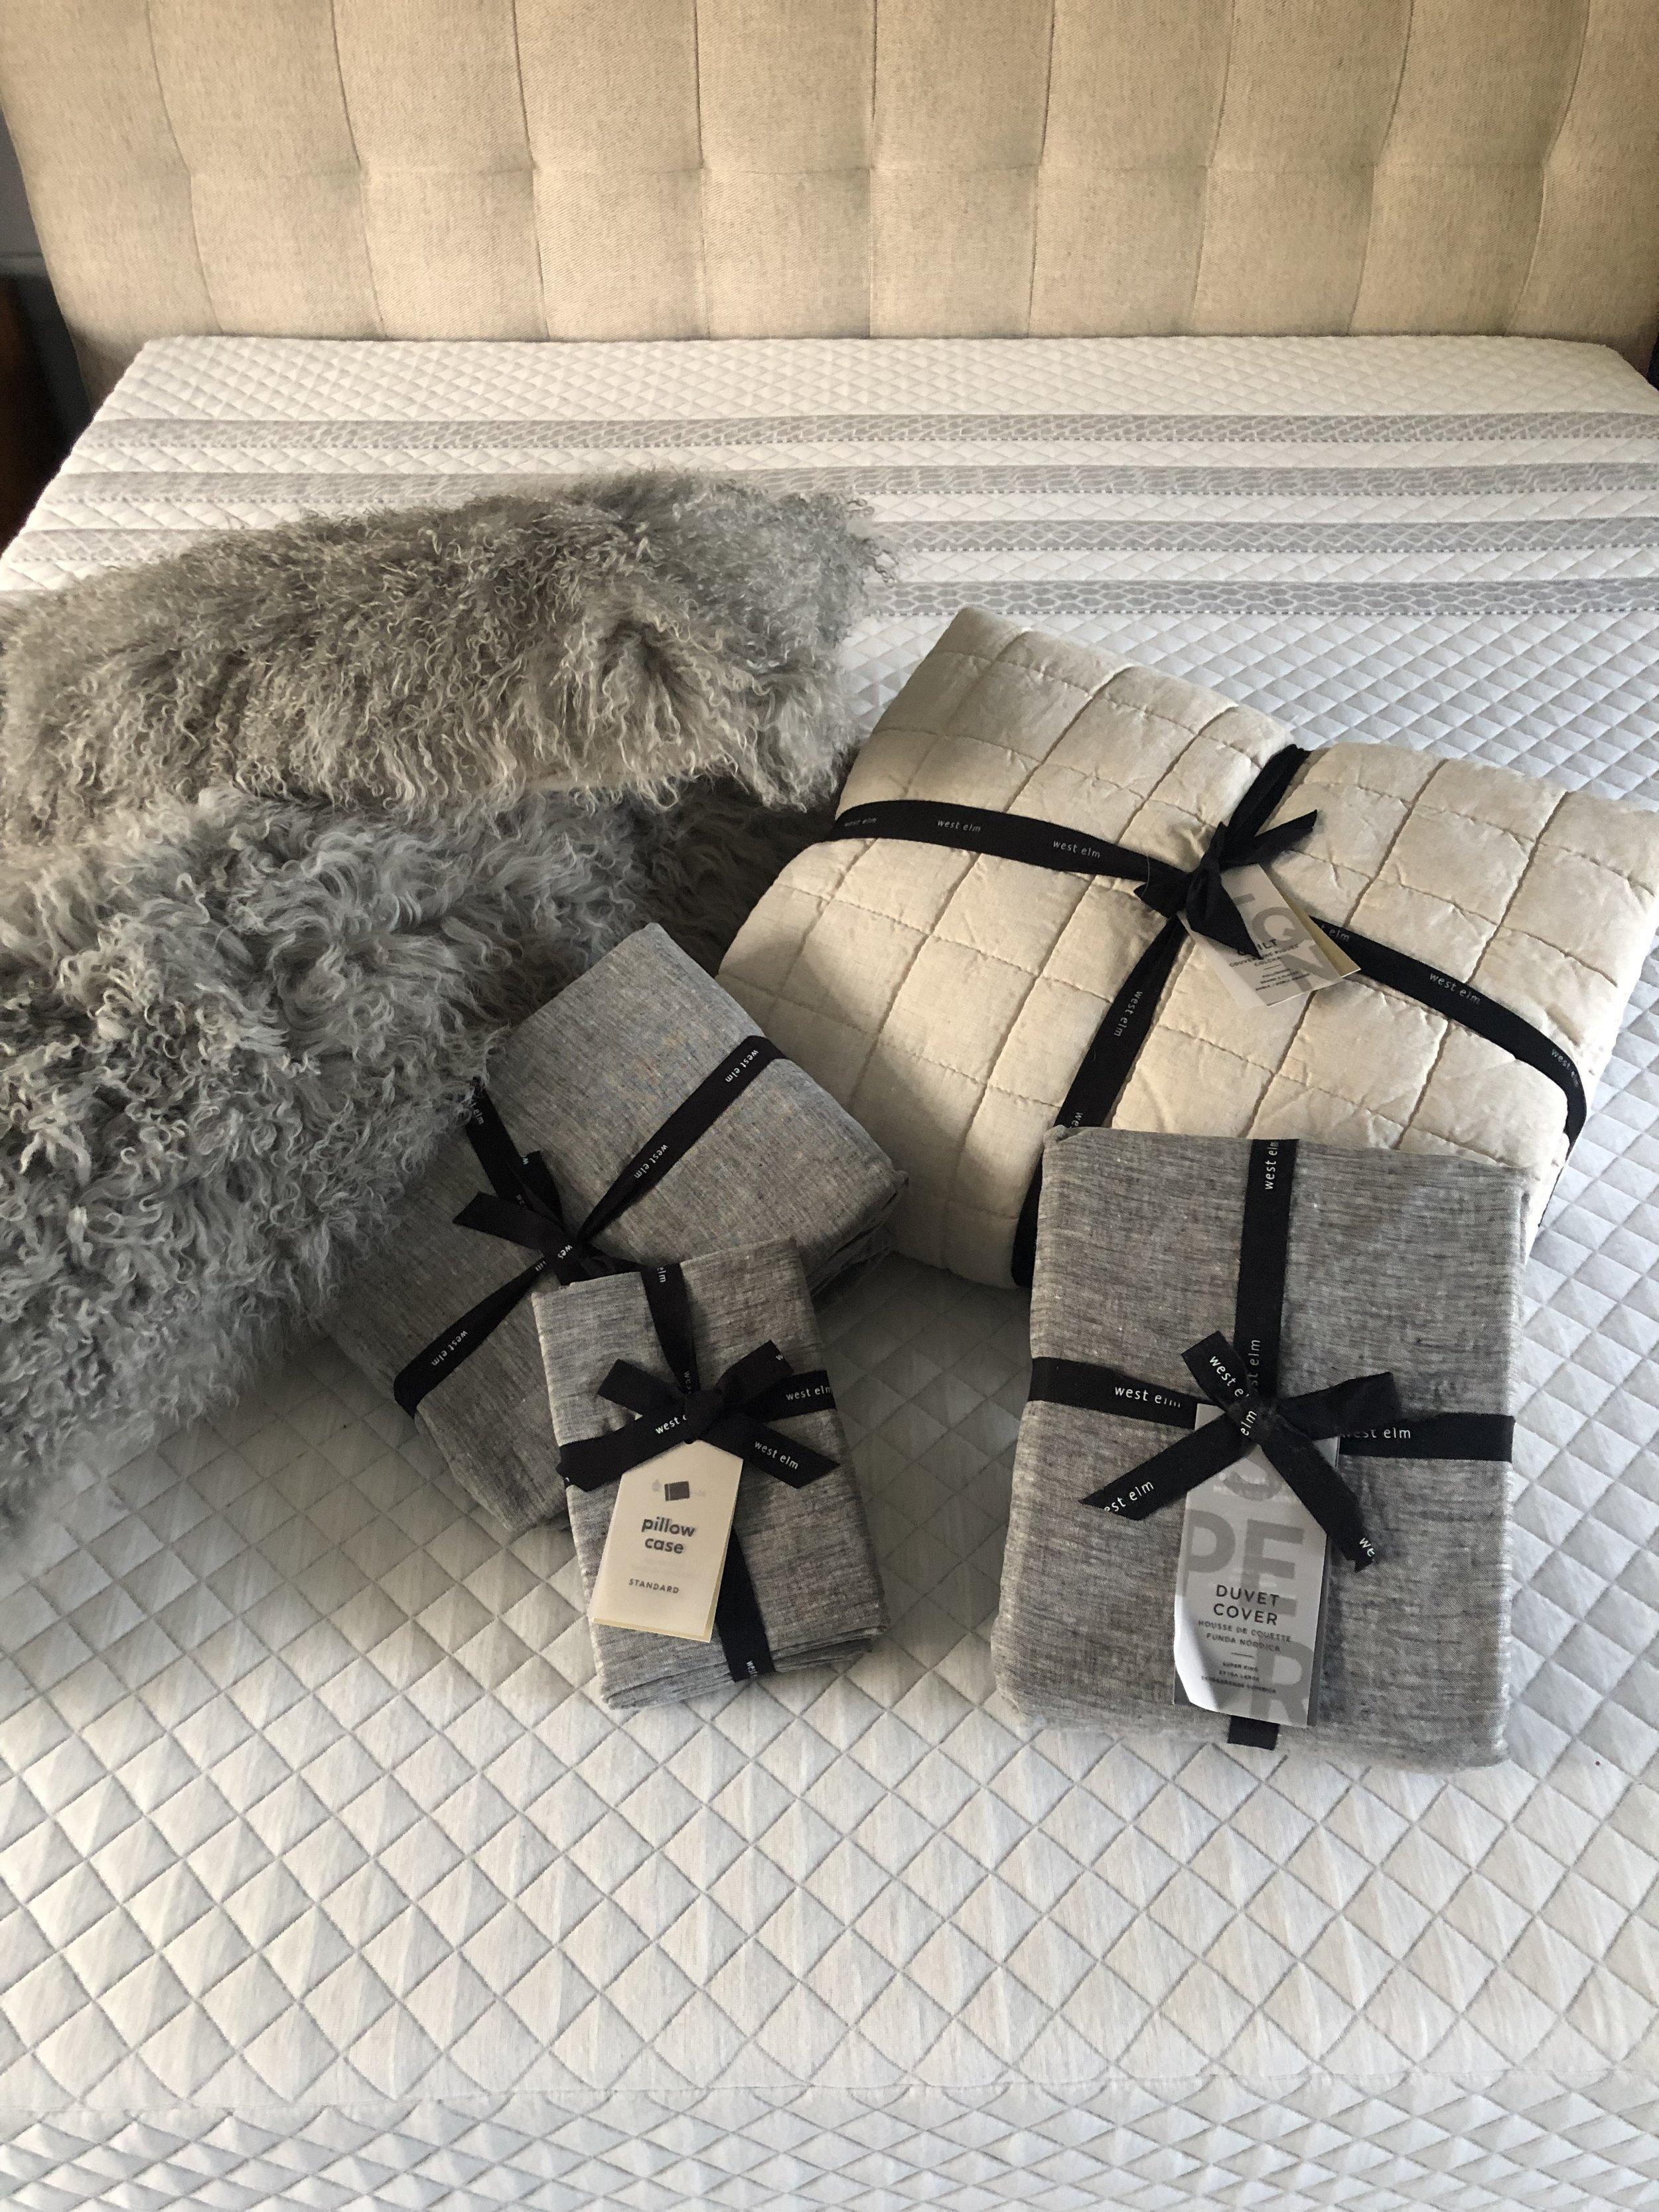 Belgian Flax Linen Melange Sheets, Duvet and Pillow Cases - Slate  Belgian Flax Linen Bedspread - Natural Flax  Mongolian Lamb Cushions - Platinum